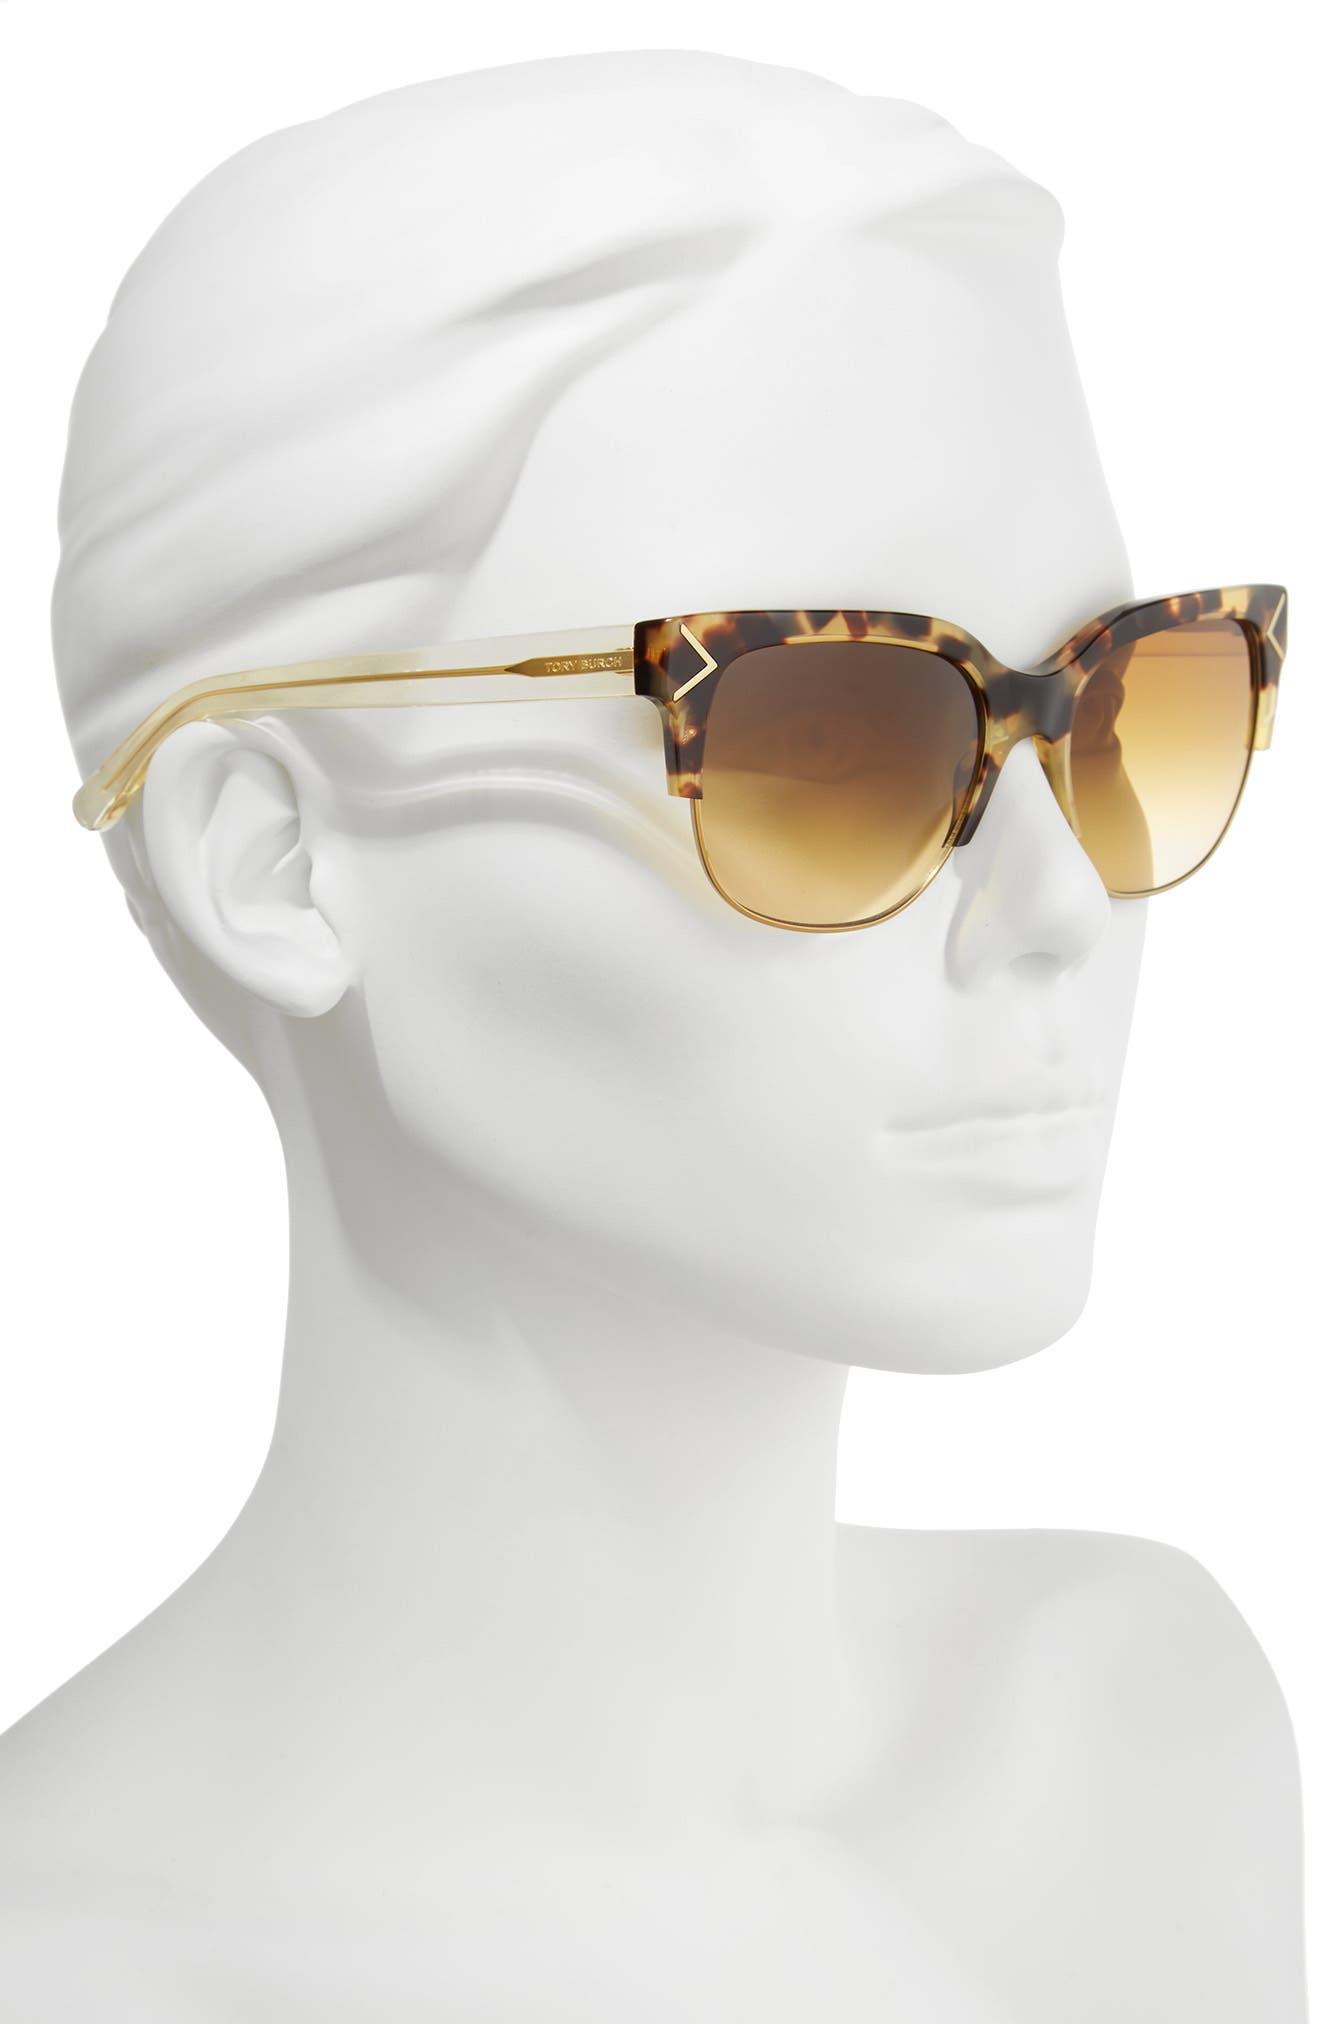 55mm Gradient Square Sunglasses,                             Alternate thumbnail 2, color,                             Gold/ Brown